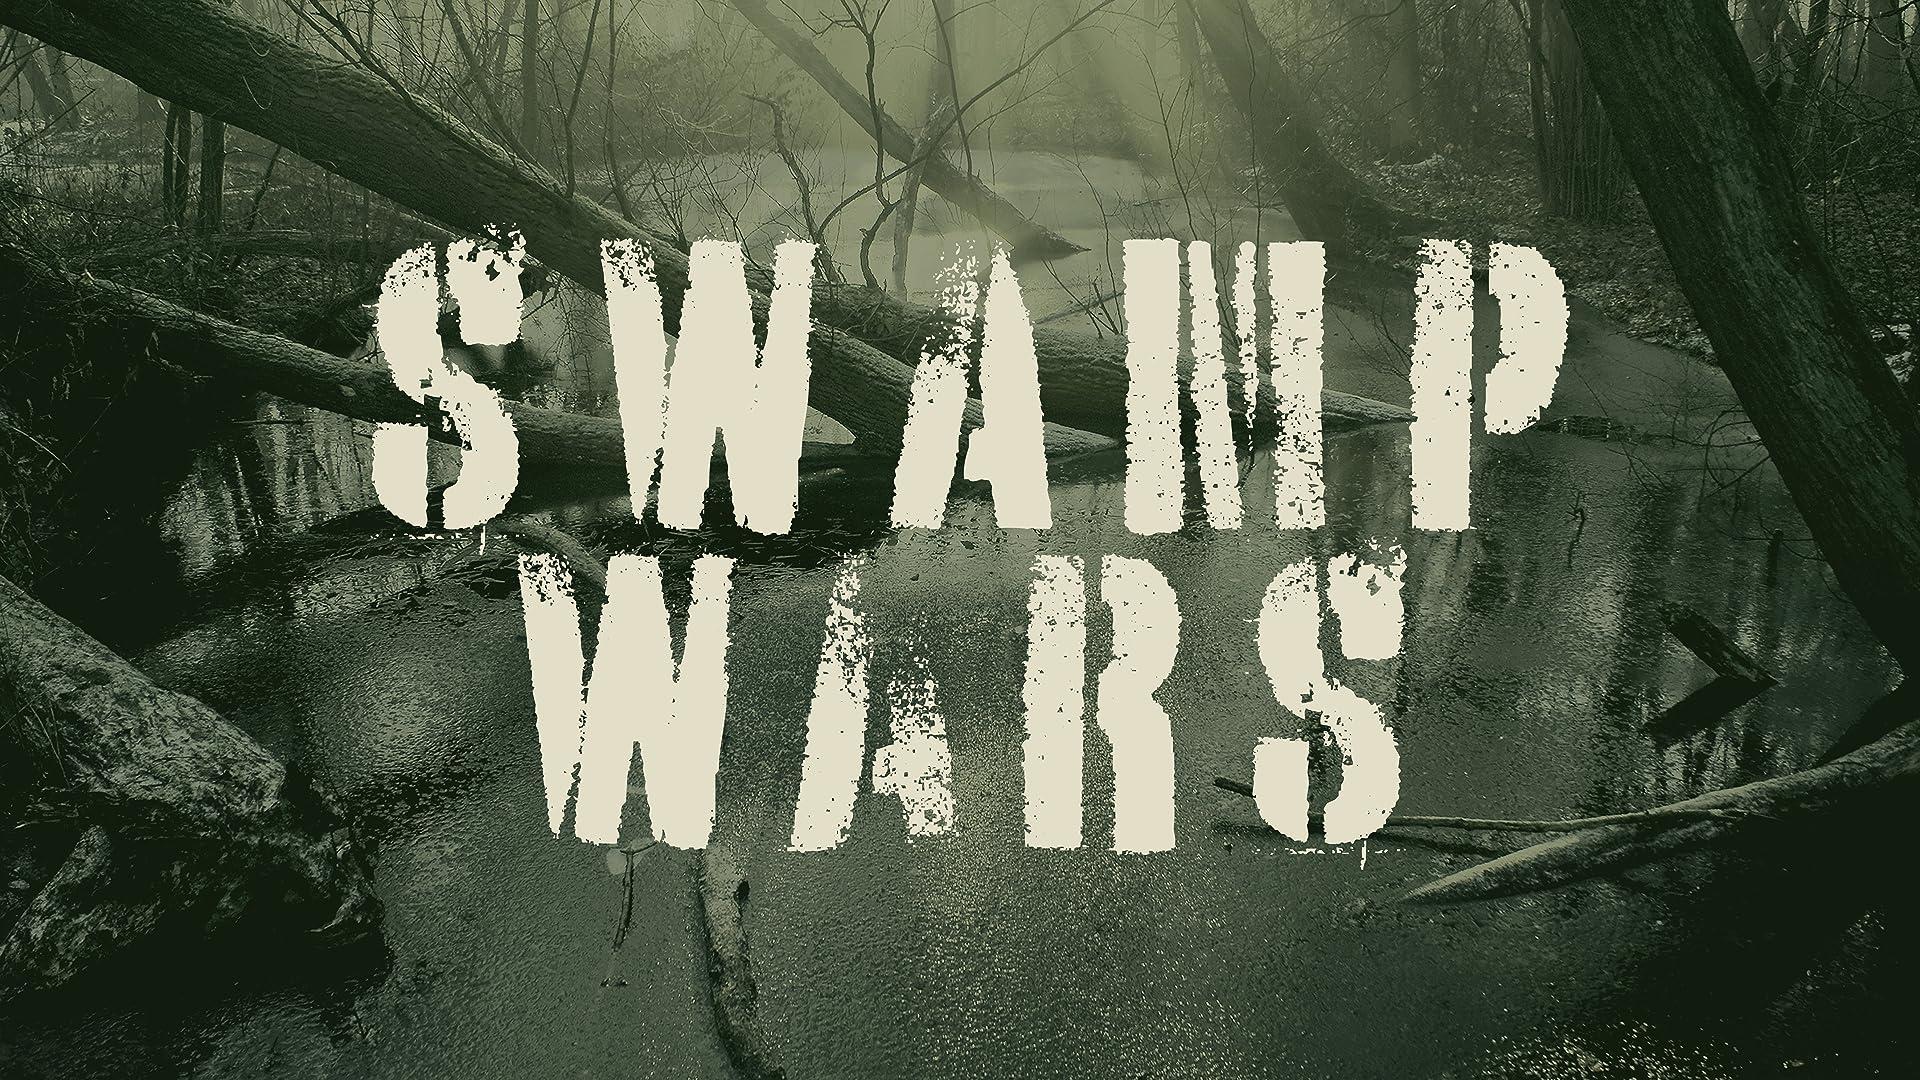 Swamp Wars - Season 1